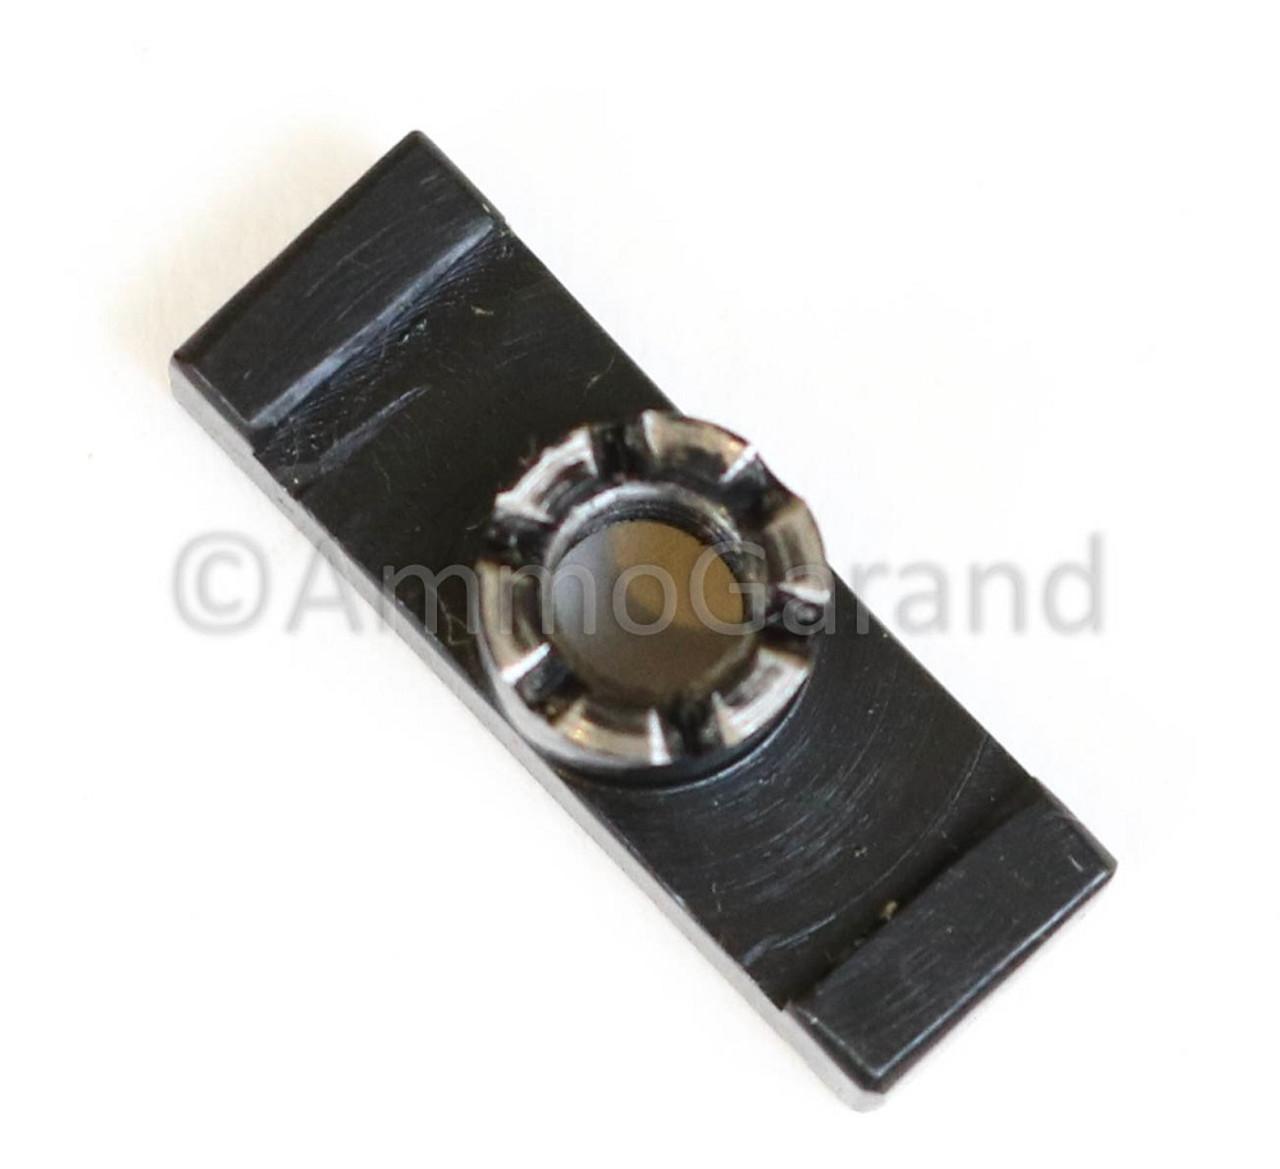 M1 Garand Type III Lock Bar Rear Sight Squared Locking Bar <br>- NEW - Replacement